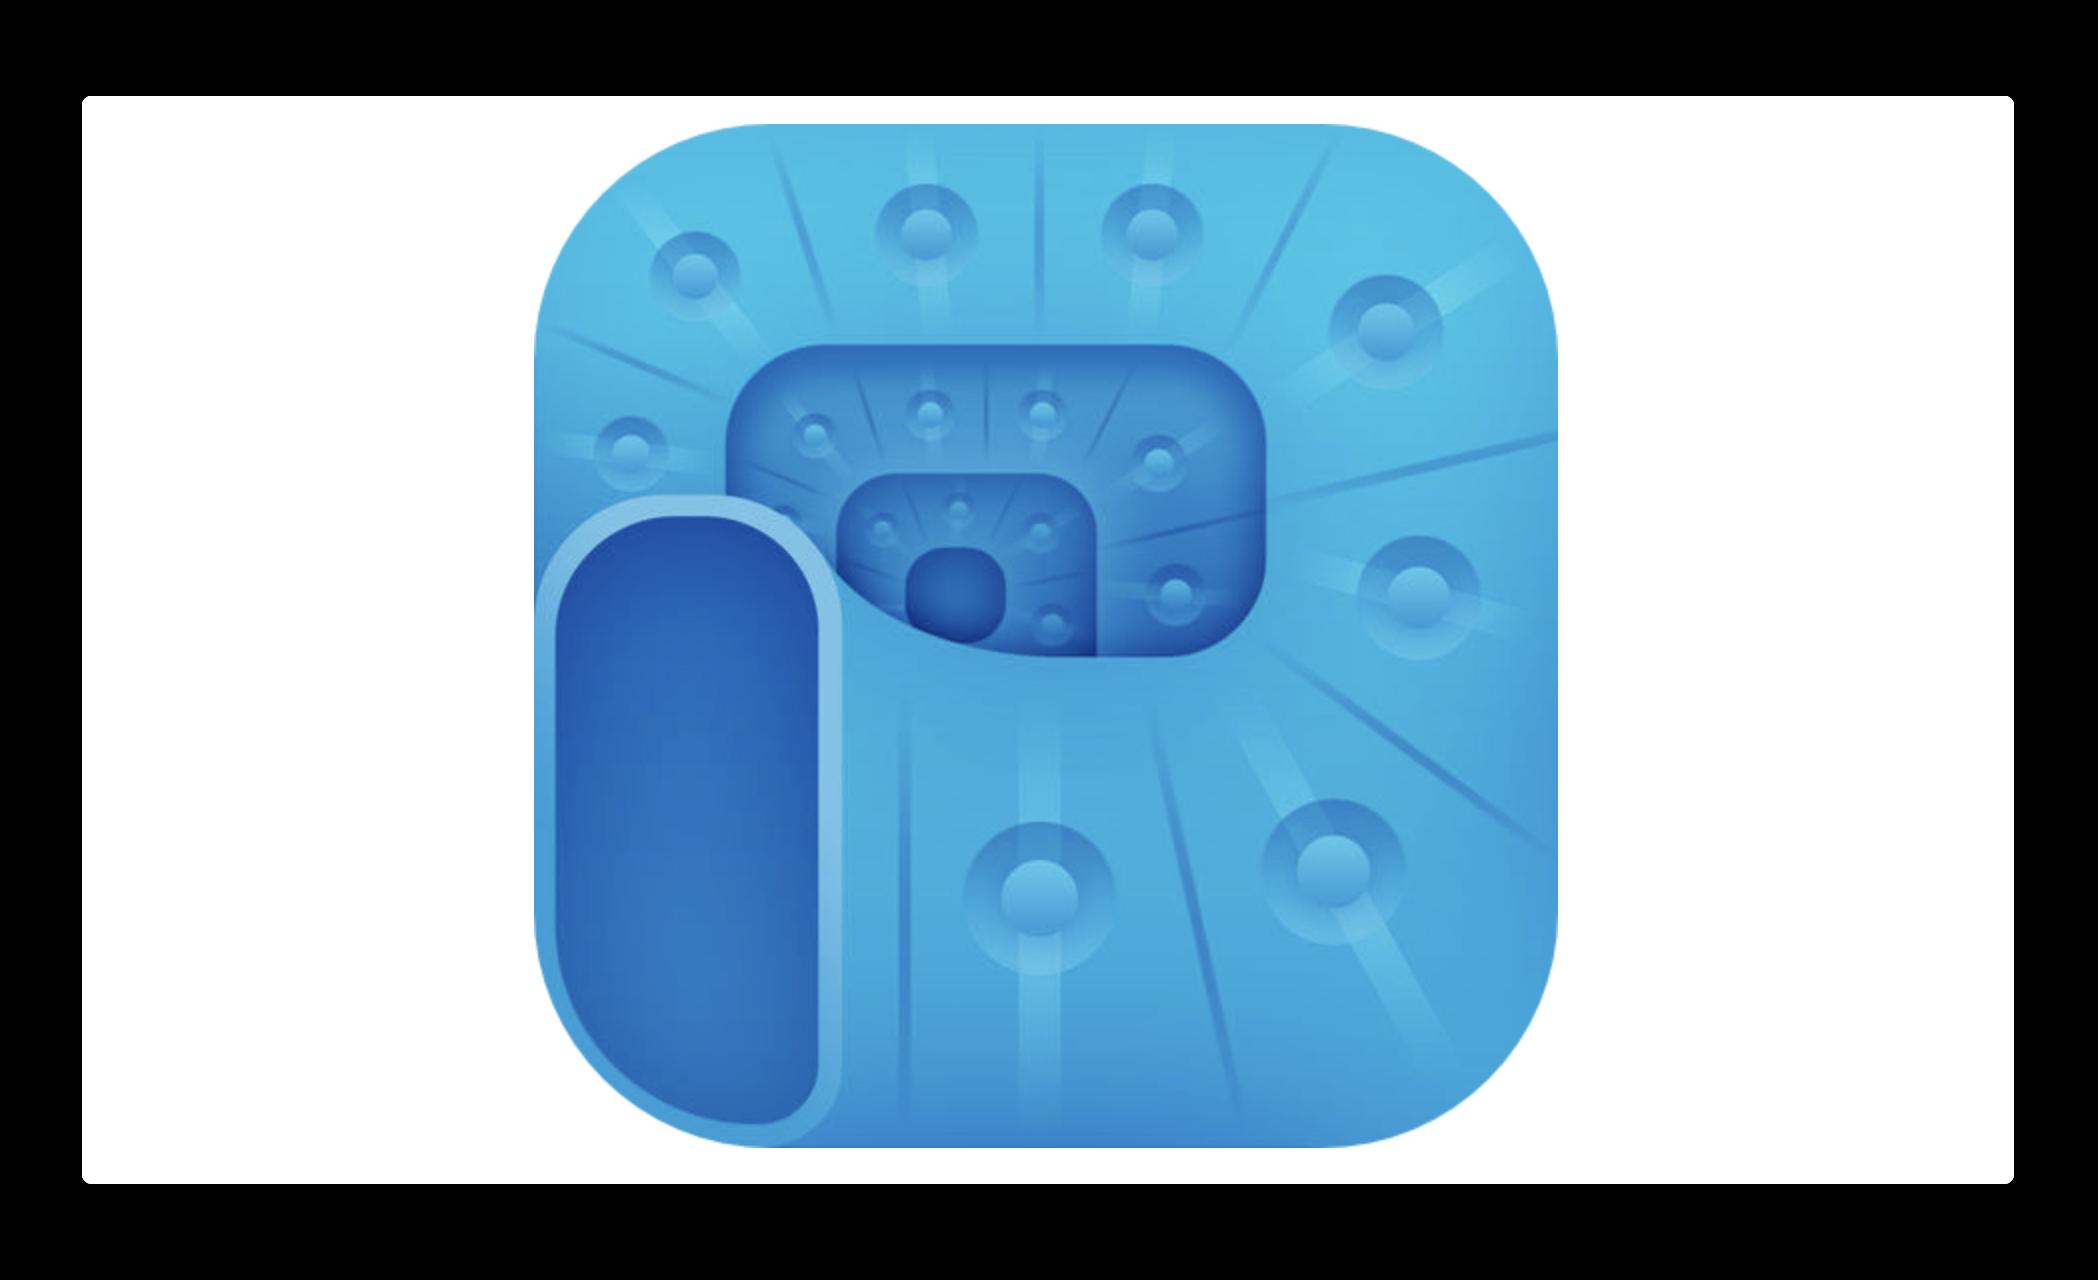 【iOS】モバイルドキュメント管理ソリューション「DEVONthink To Go」バージョンアップでバックグラウンド同期を改善する